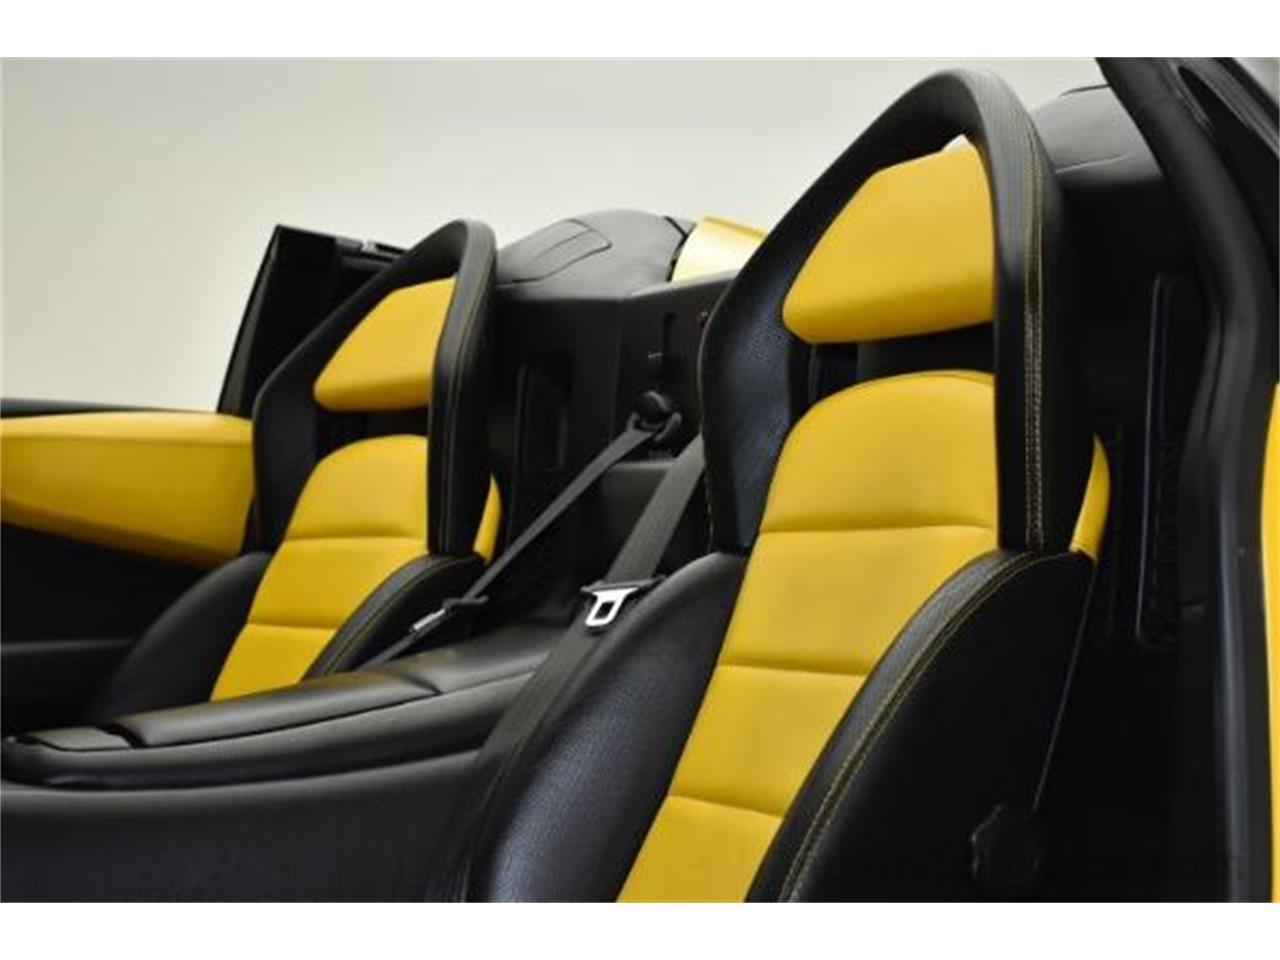 Large Picture of '05 Lamborghini Murcielago located in Syosset New York - $159,000.00 - L6CF